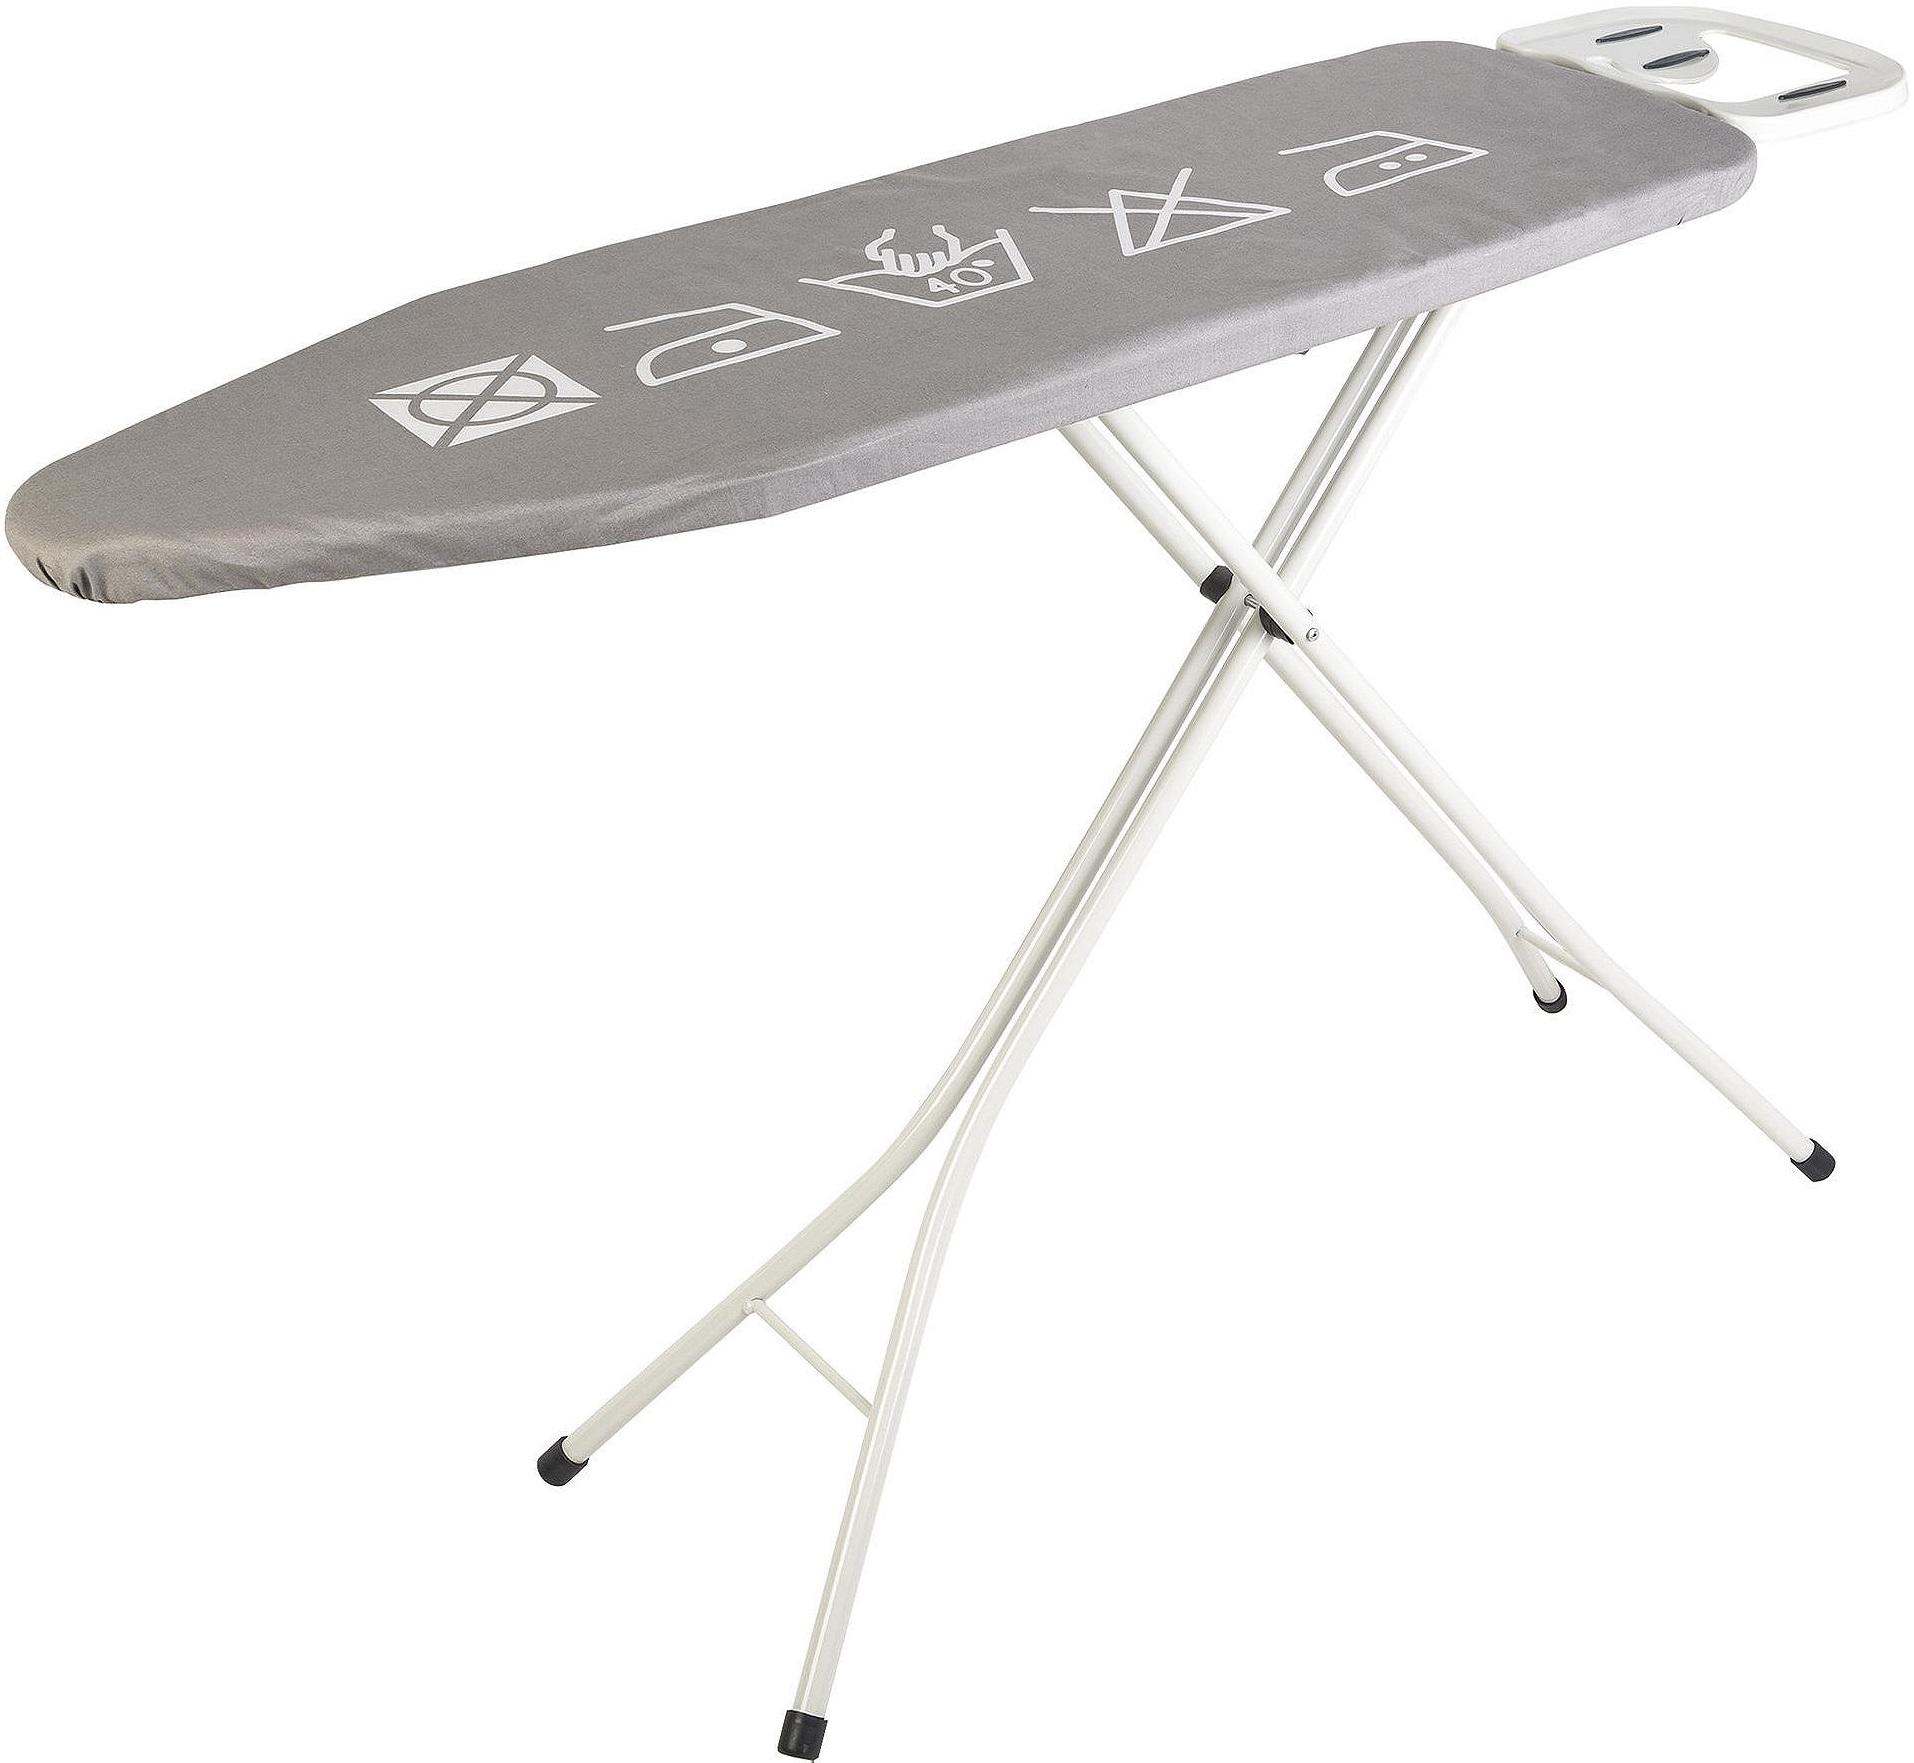 tesco height adjustable medium ironing board 114cm x 38cm. Black Bedroom Furniture Sets. Home Design Ideas